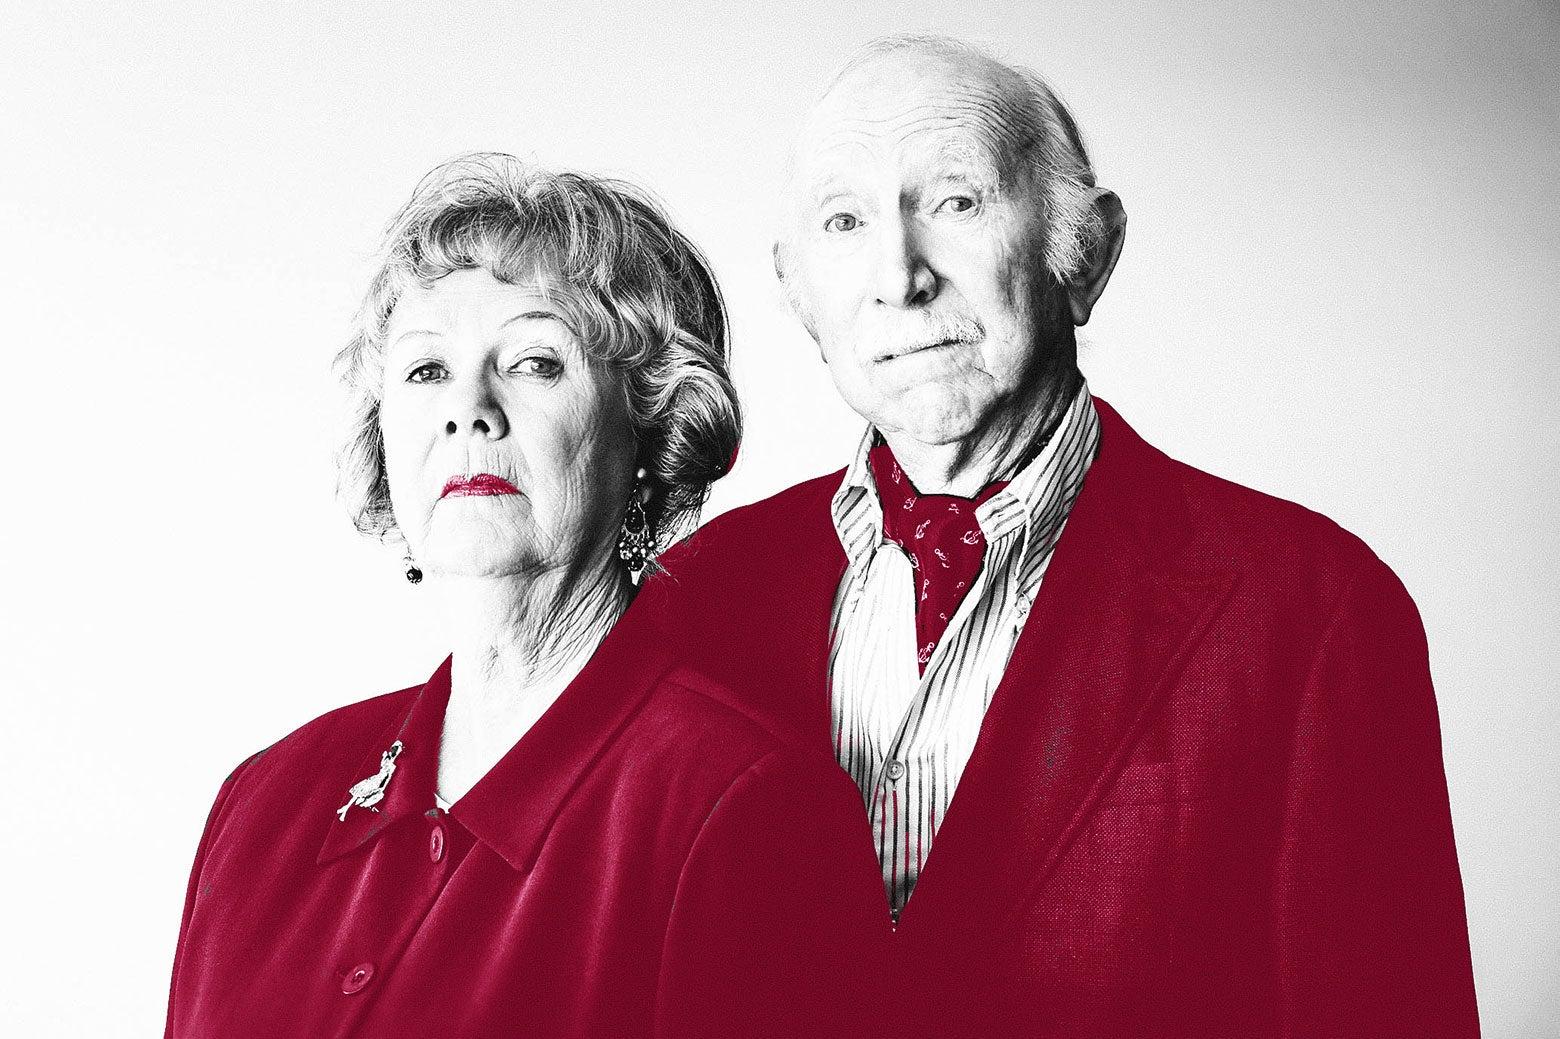 Stern-looking elderly parents.